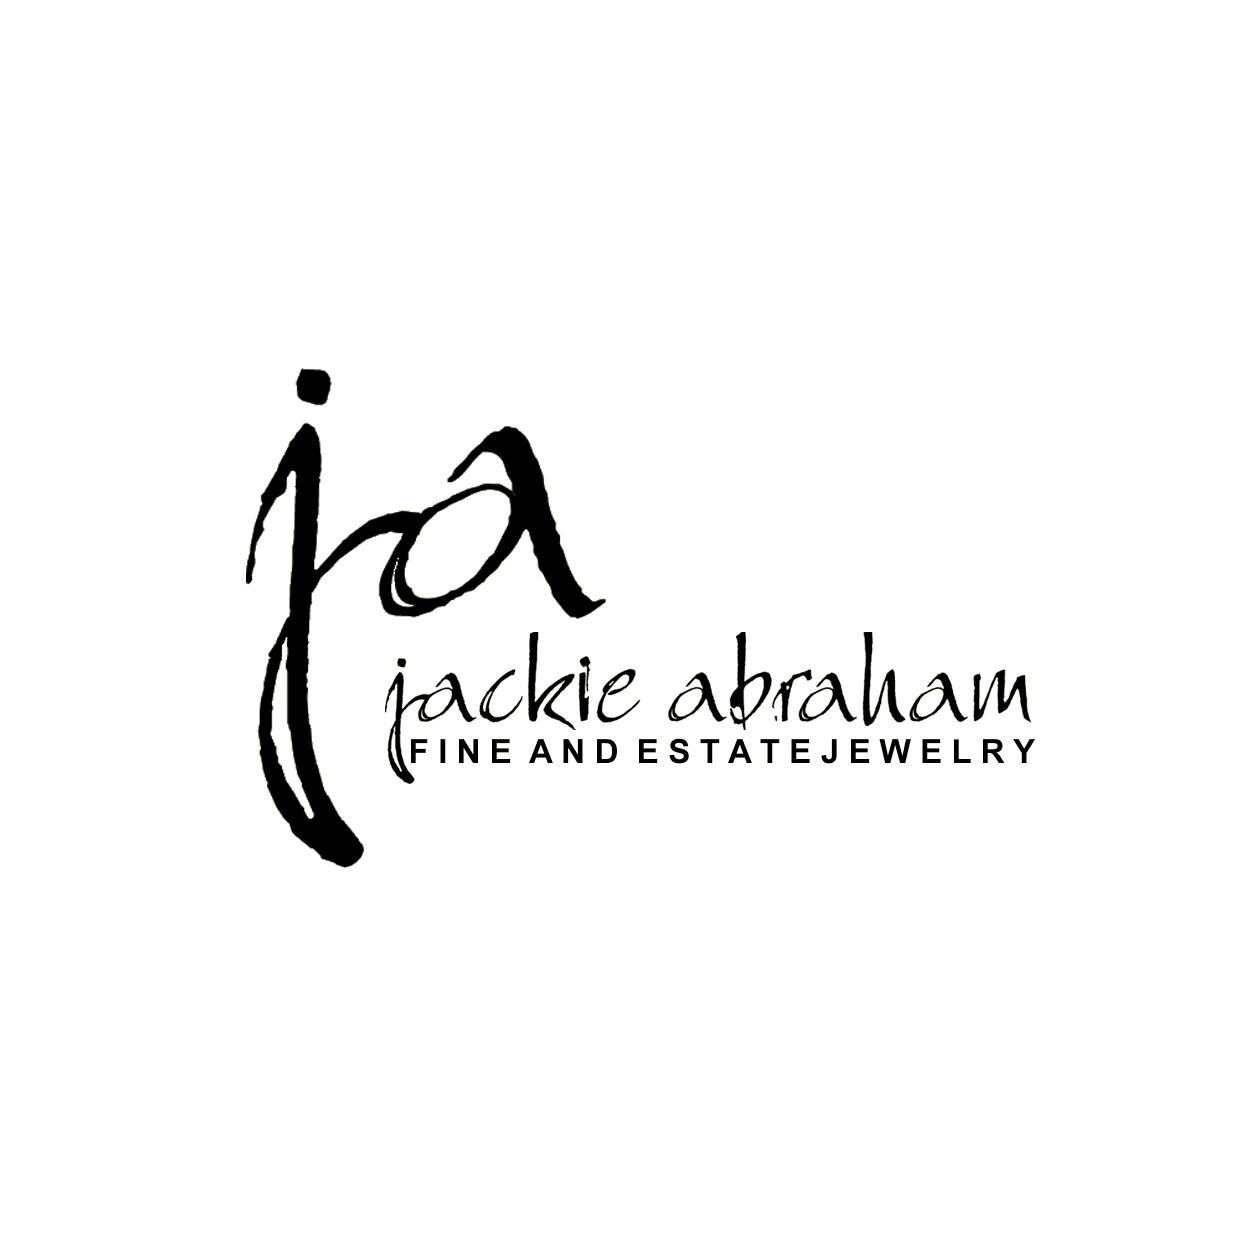 Jackie Abraham Jewelers image 30